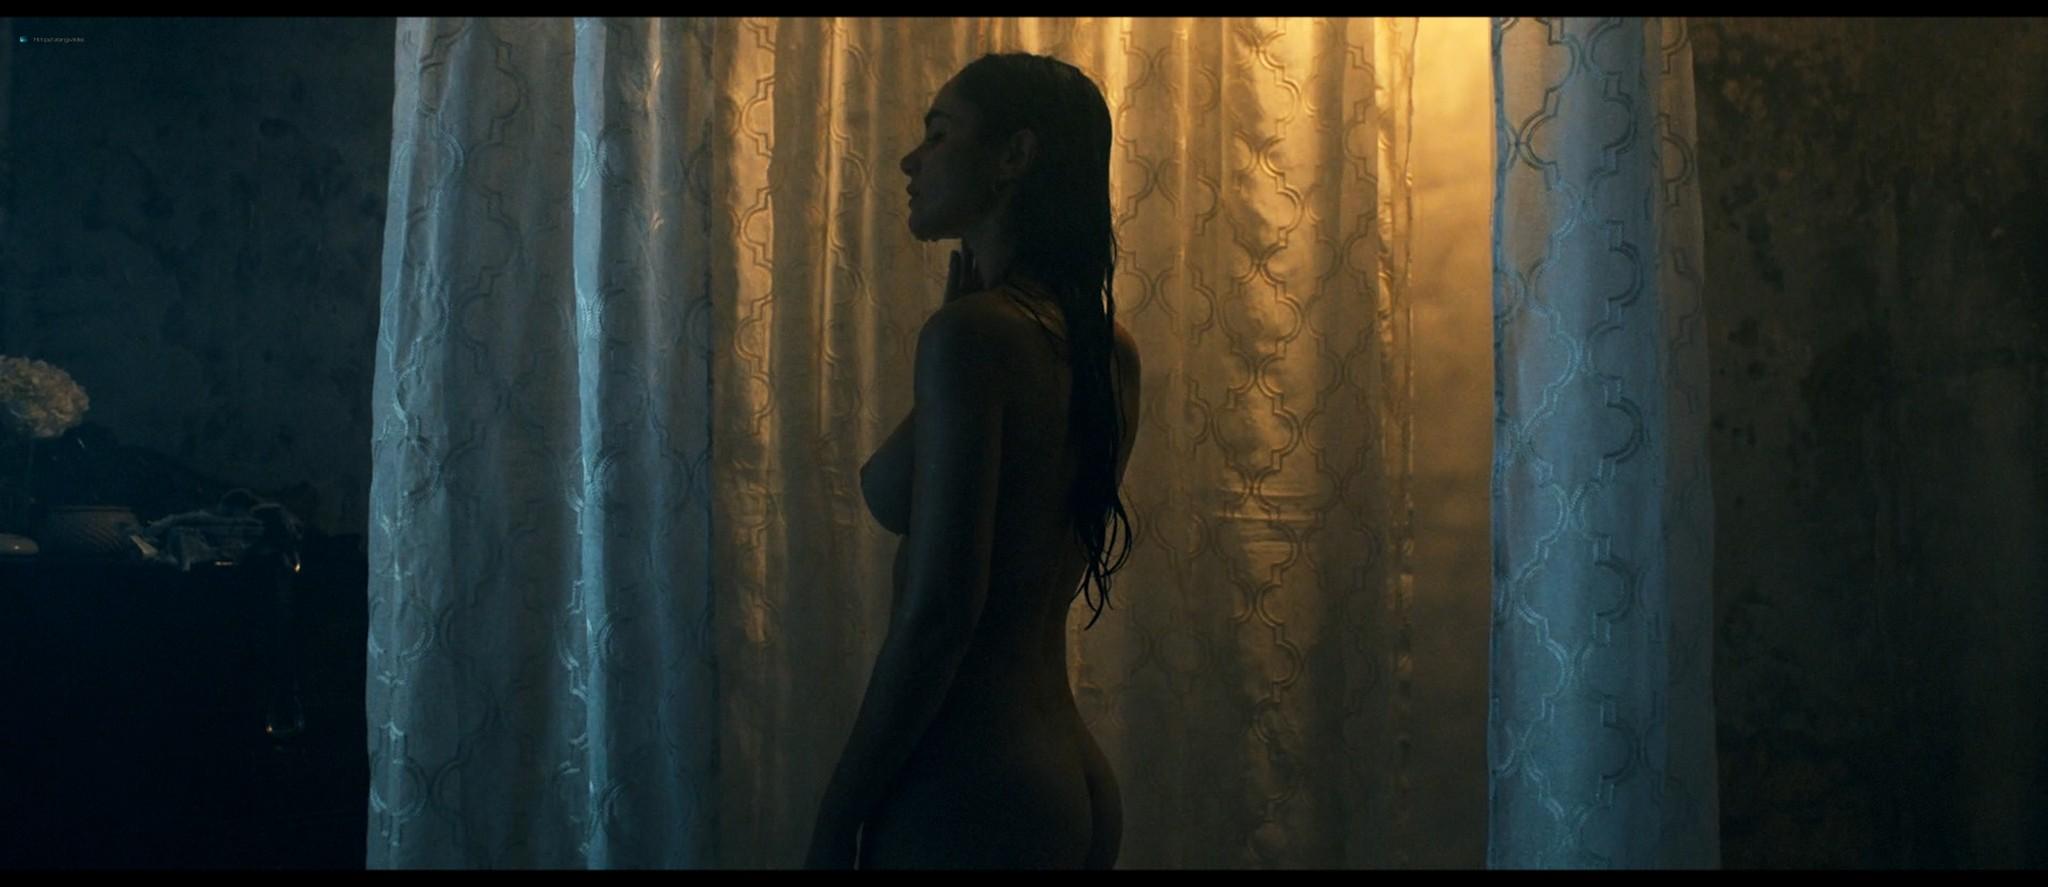 Alicia Sanz nude hot sex - En Brazos de un sesino (2019) HD 1080p Web (17)